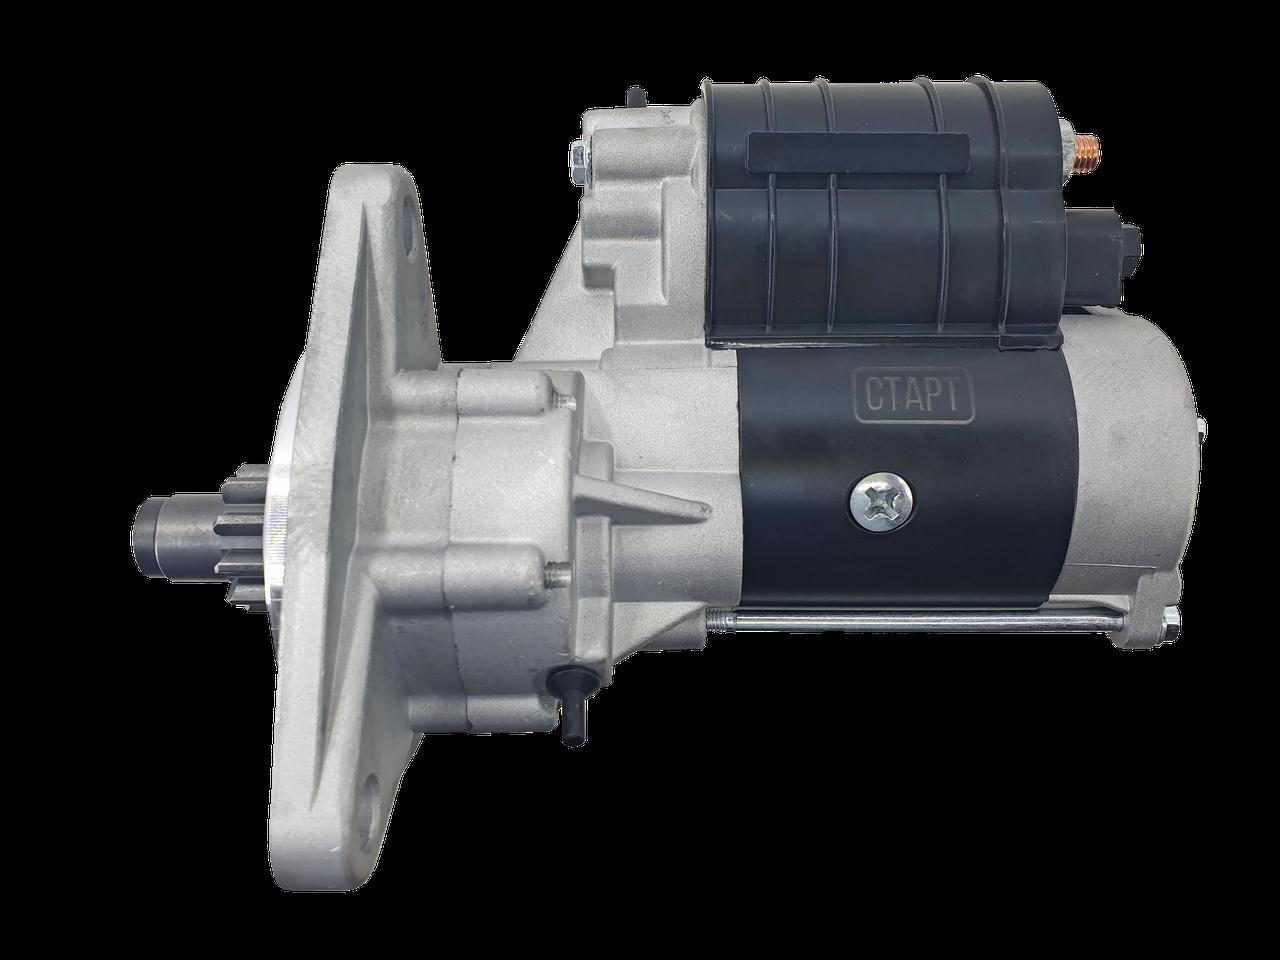 Стартер 12В 2,8 кВт МТЗ, Т40, Т25, Т16 (посилений)